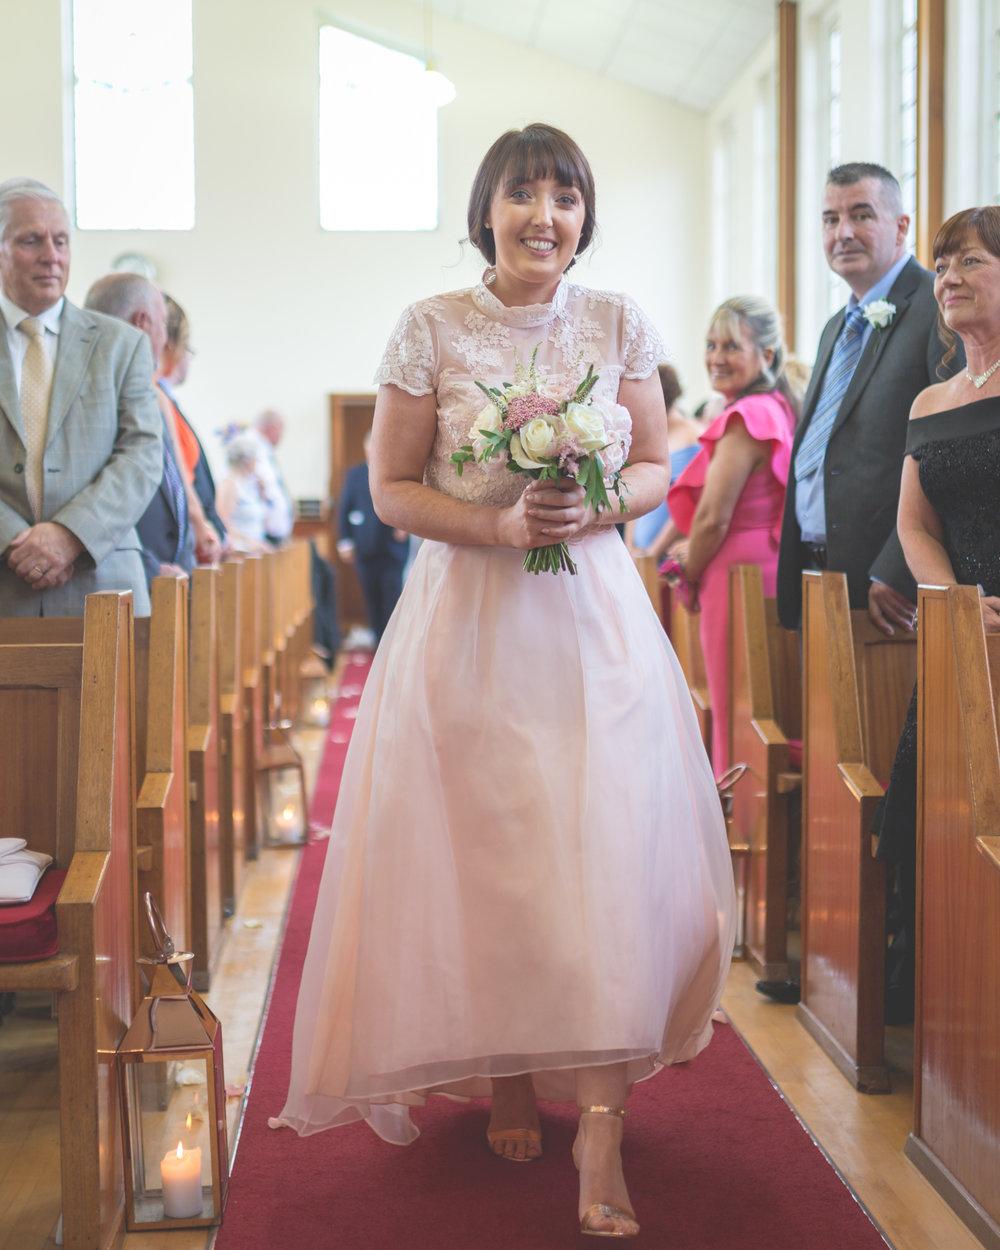 Brian McEwan | Northern Ireland Wedding Photographer | Rebecca & Michael | Ceremony-15.jpg